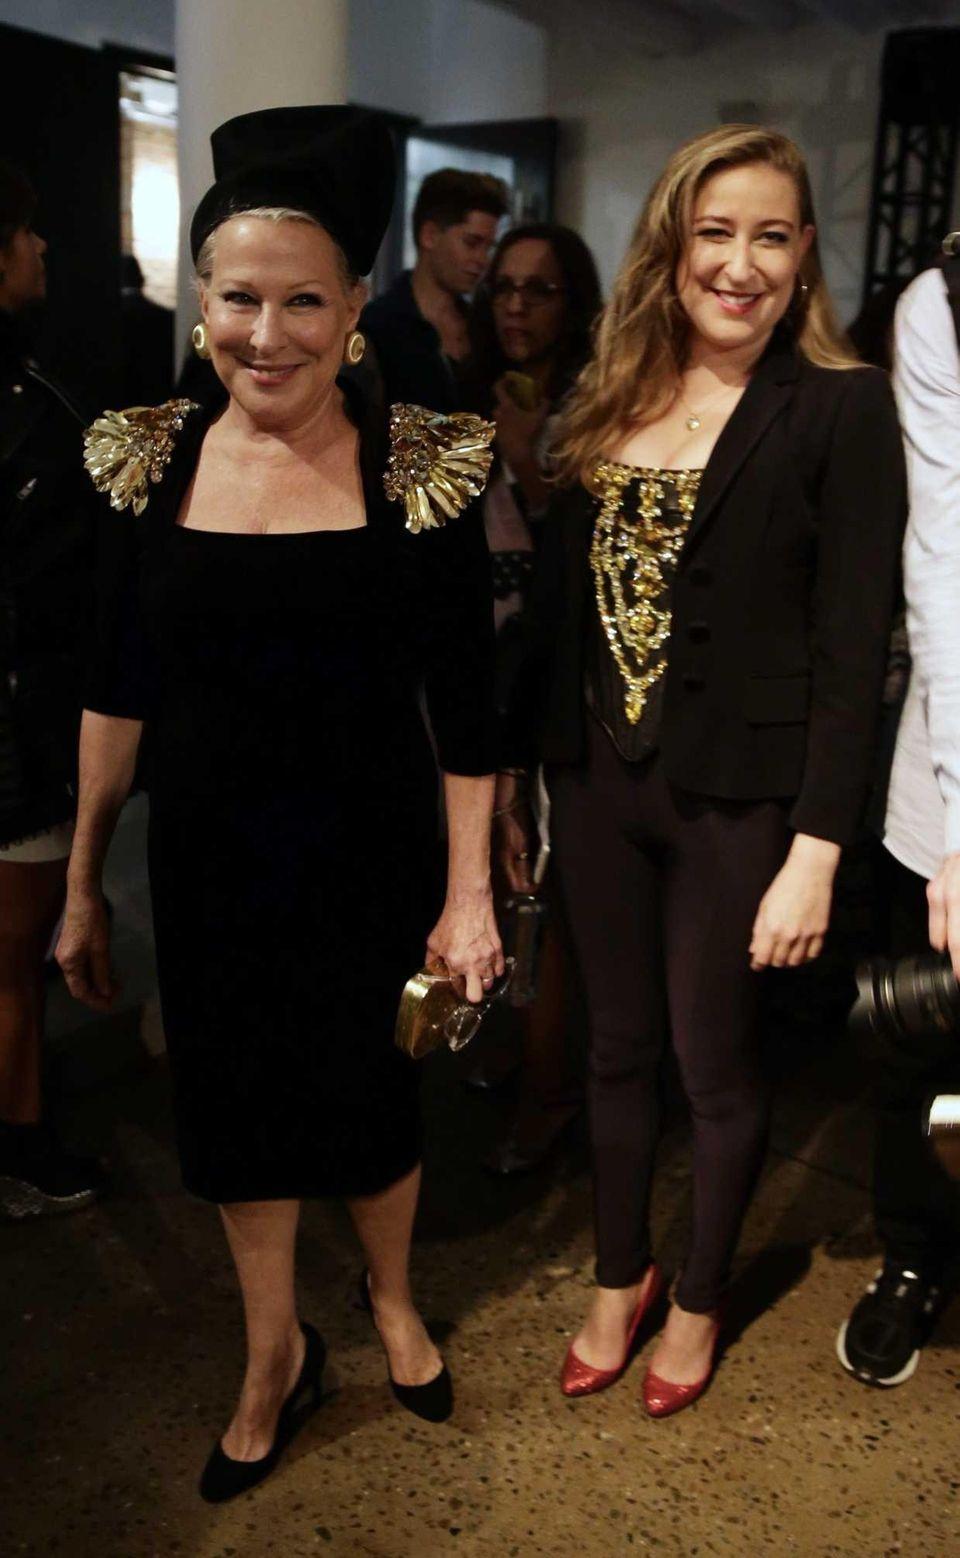 Bette Midler, left, and her daughter Sophie von